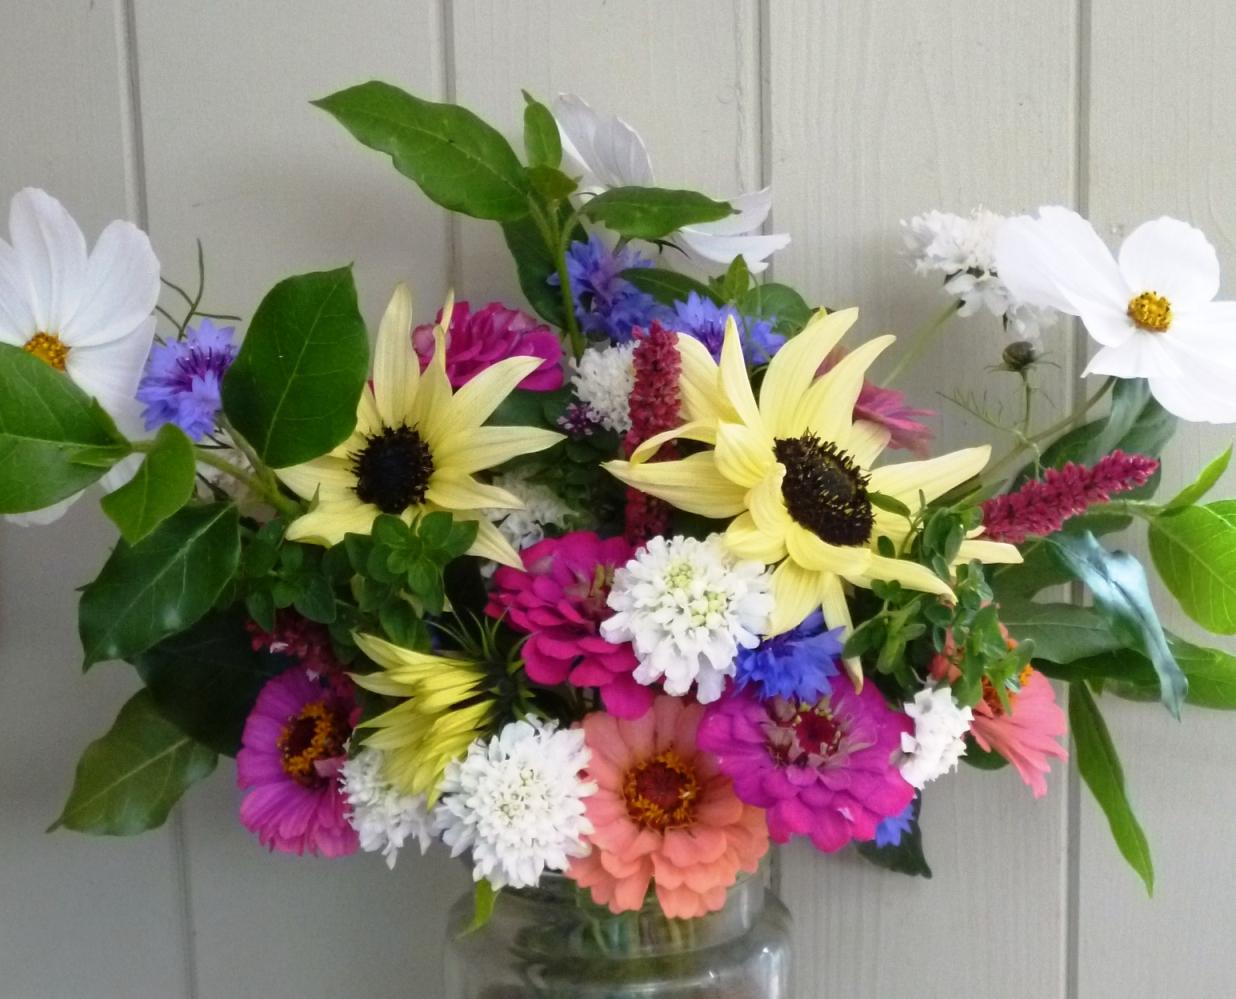 Top 10 Annual Flowers For Cutting Gardens Home Flower Garden